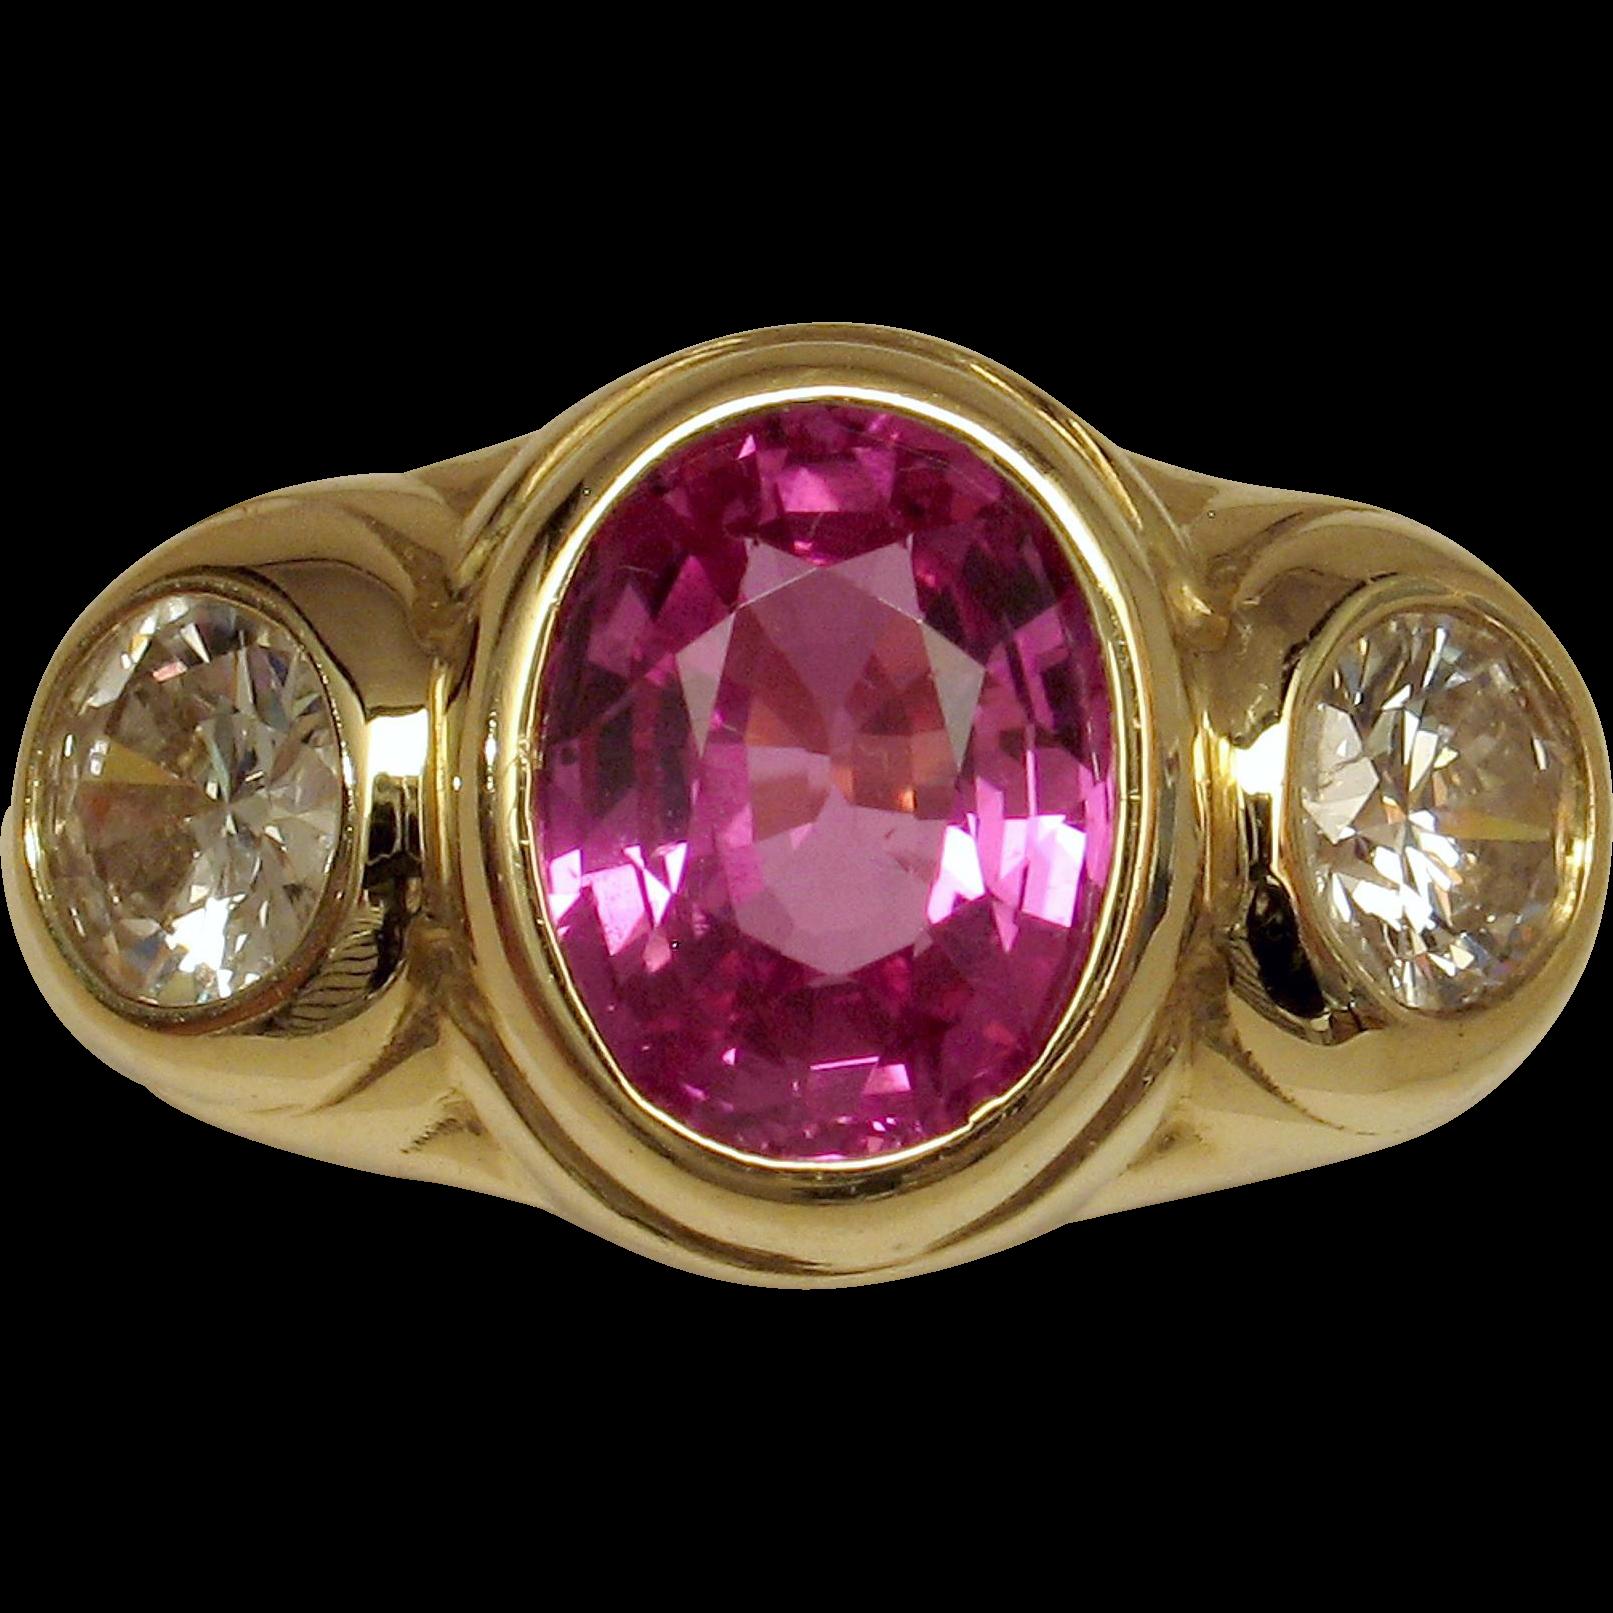 Magnificent Vivid Hot Pink Sapphire & Diamond 3-Stone Ring